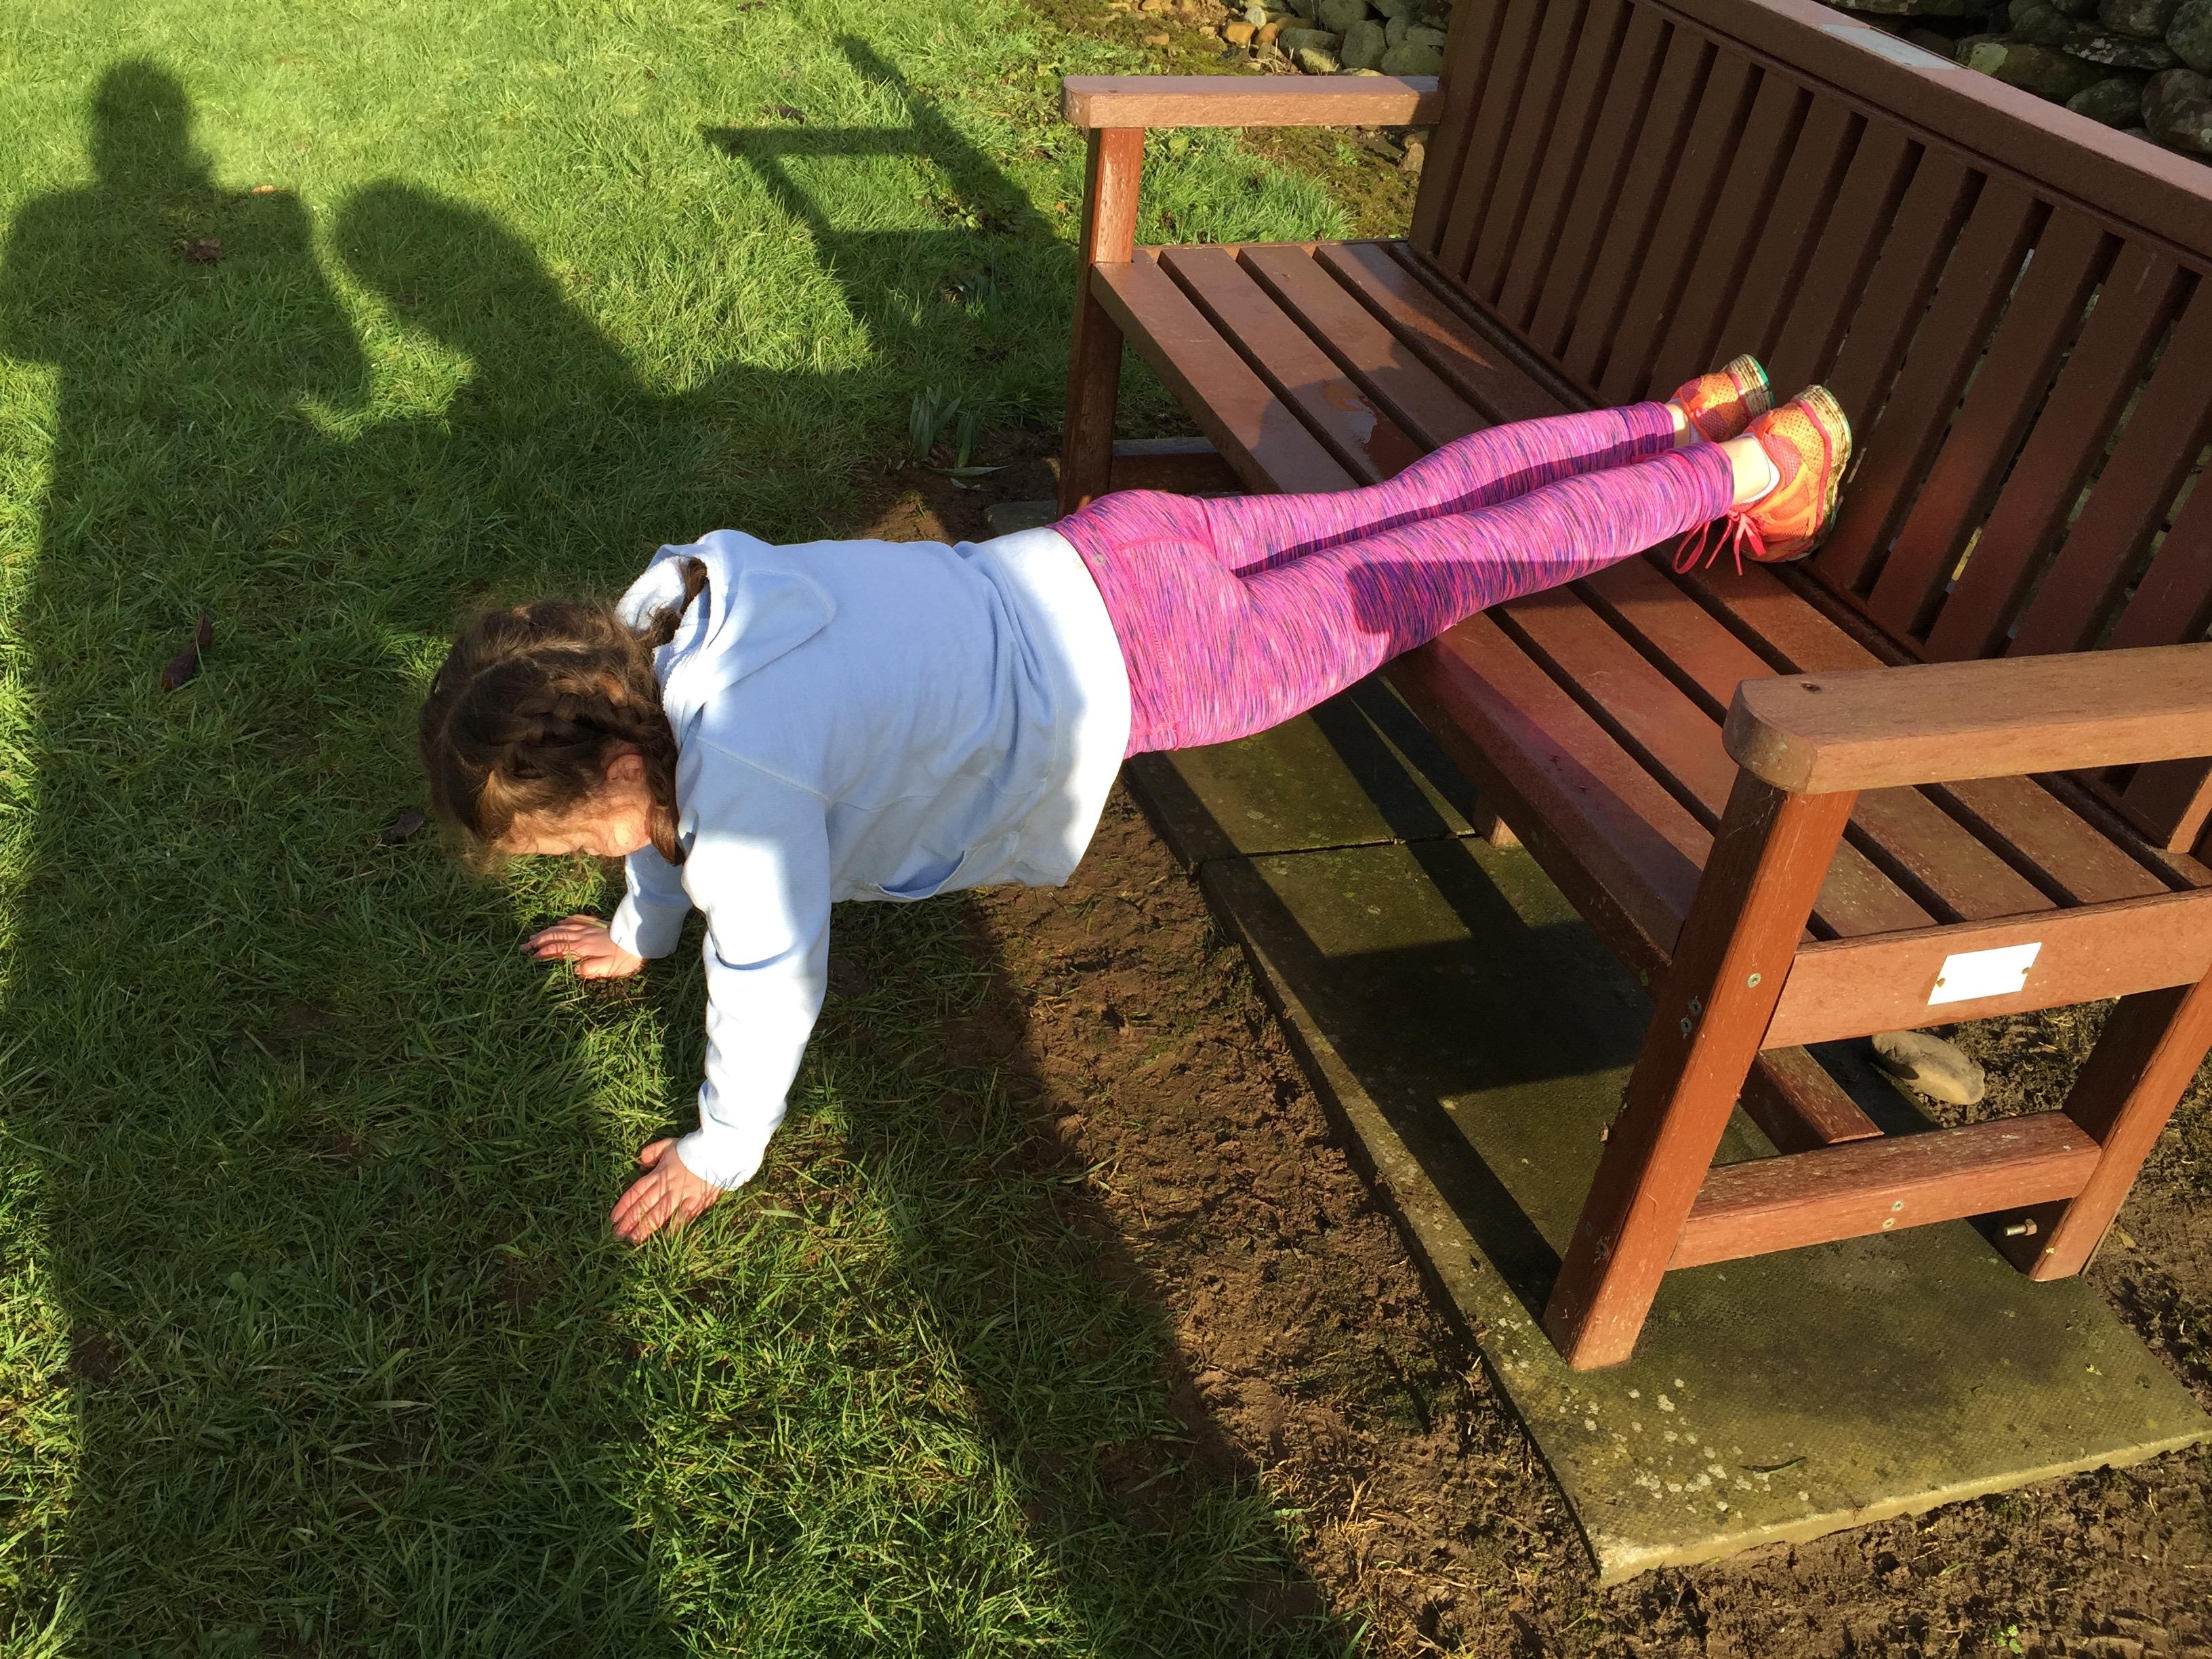 girl doing bench push ups